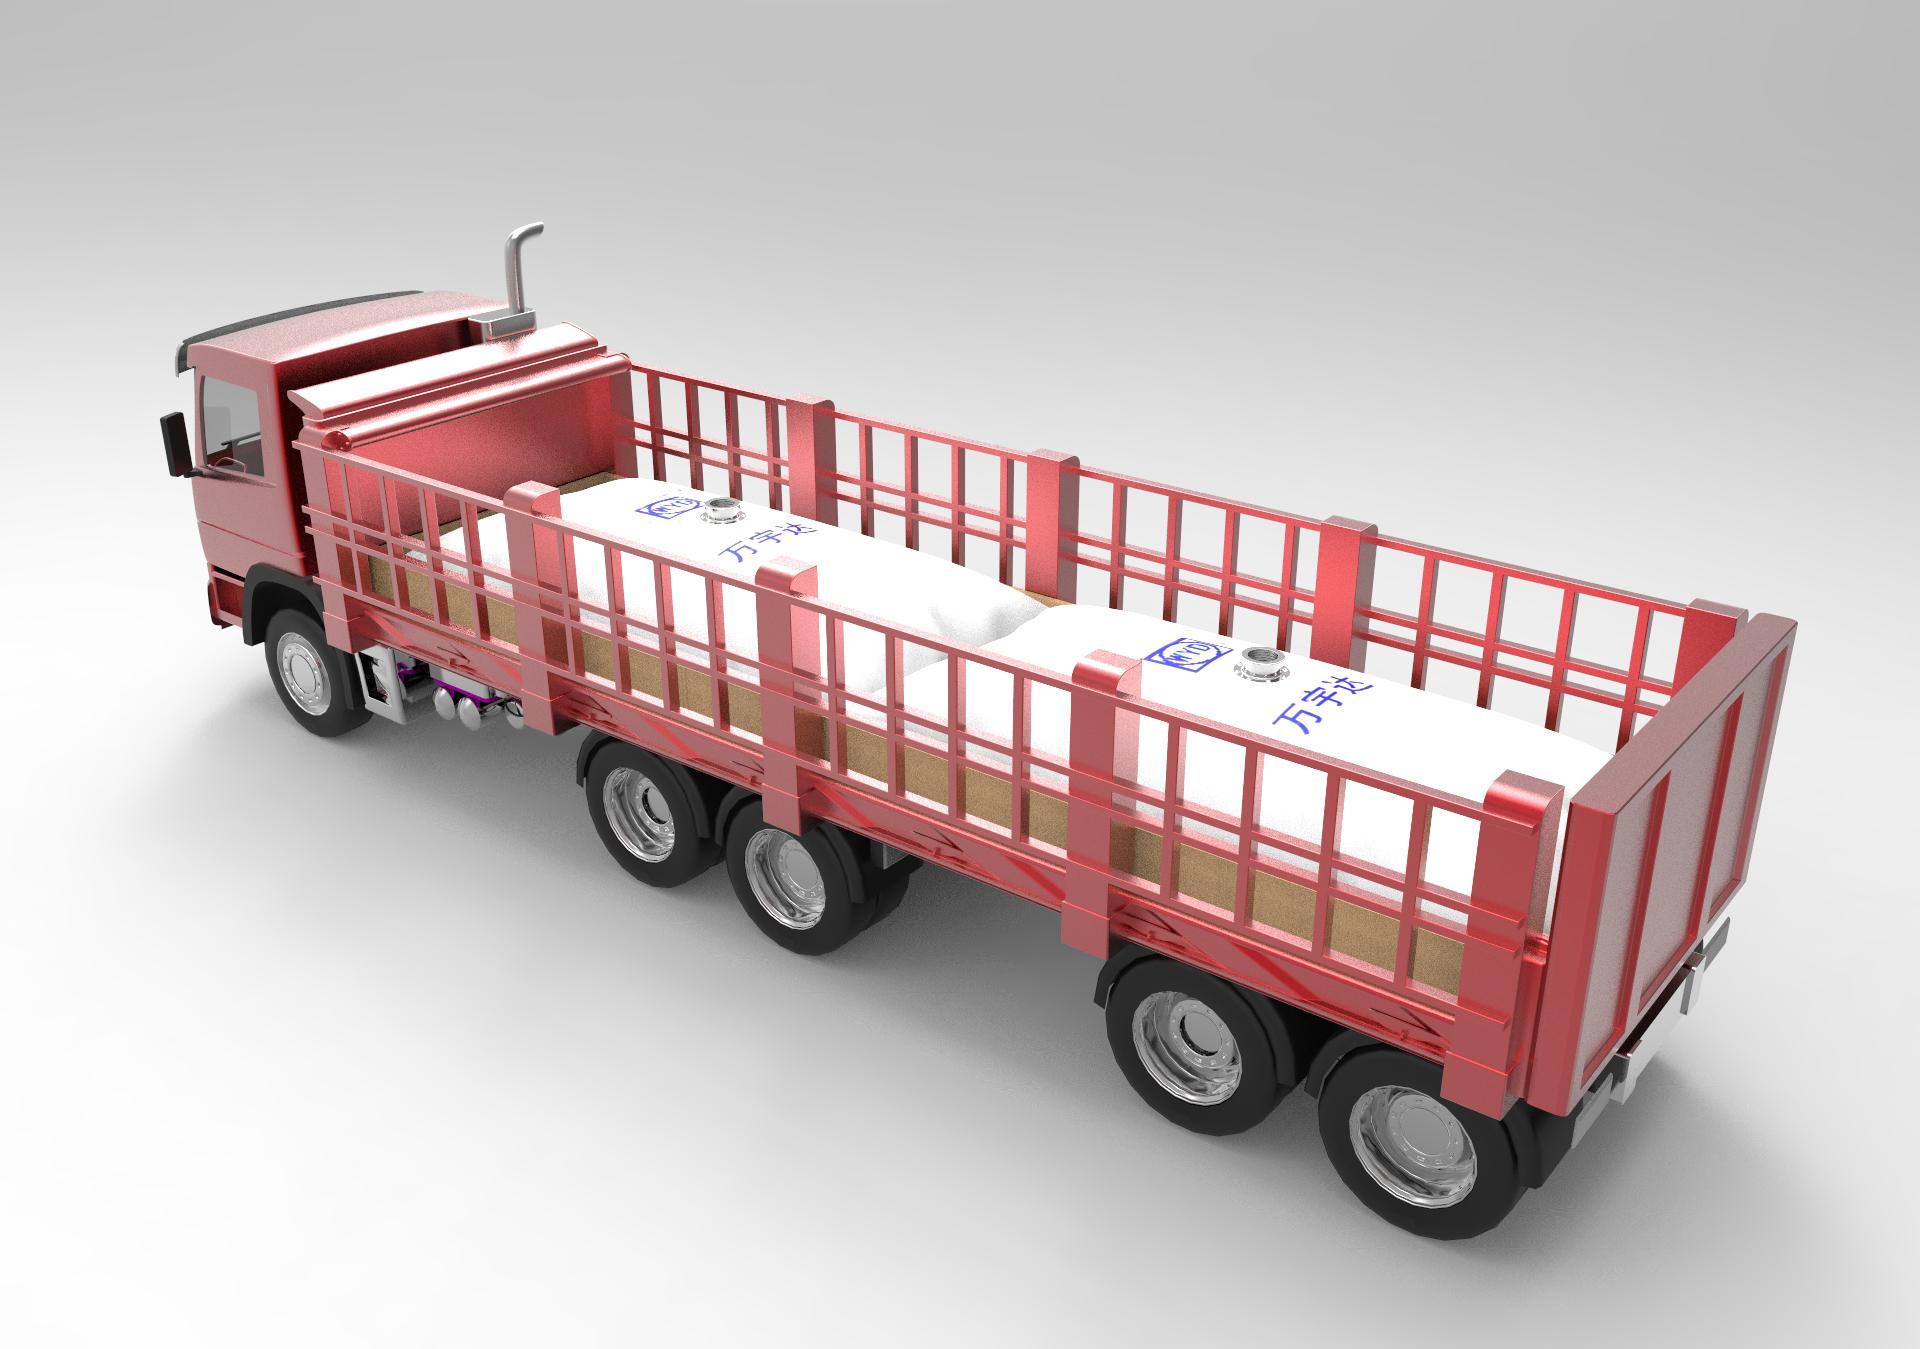 Quality Truck trailer flexitank Liquid bag FLEXITANK IN TRUCK